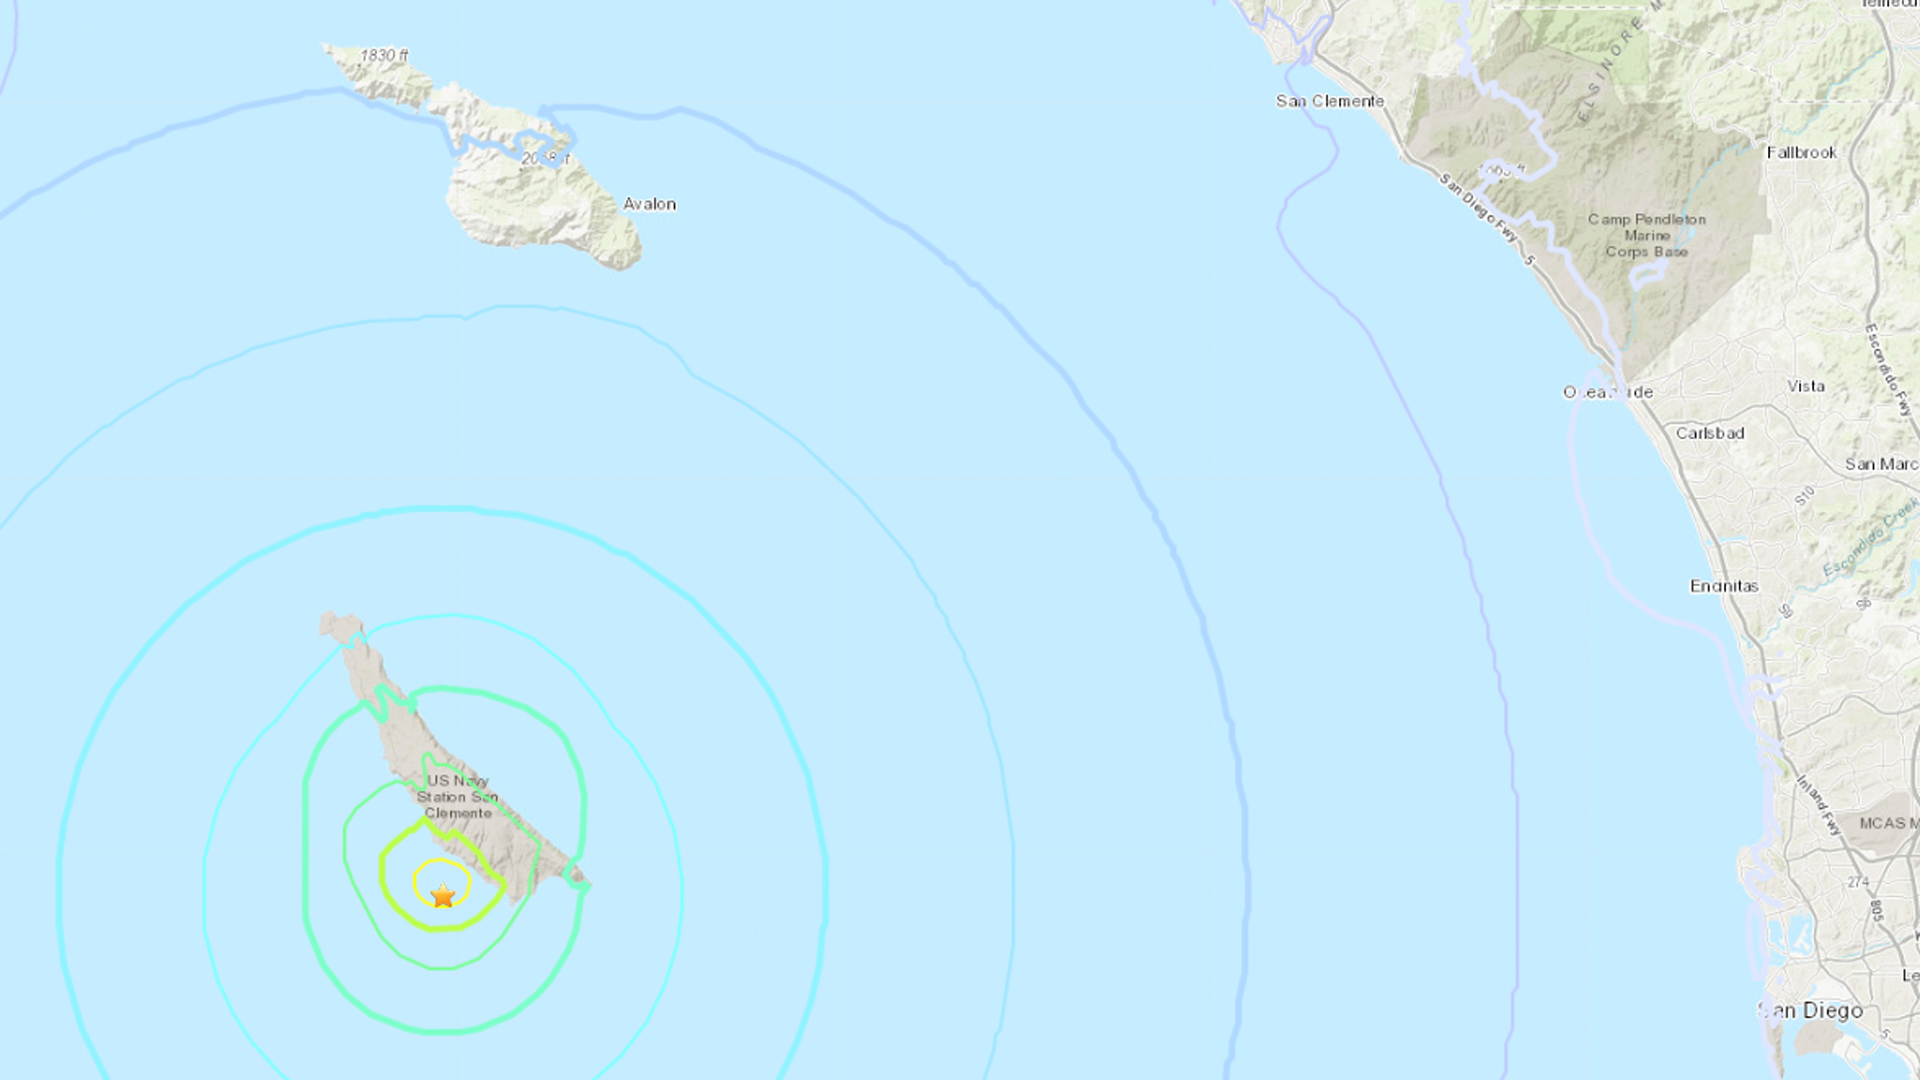 A 4.3 earthquake struck near Avalon on June 5, 2019. (Credit: USGS)